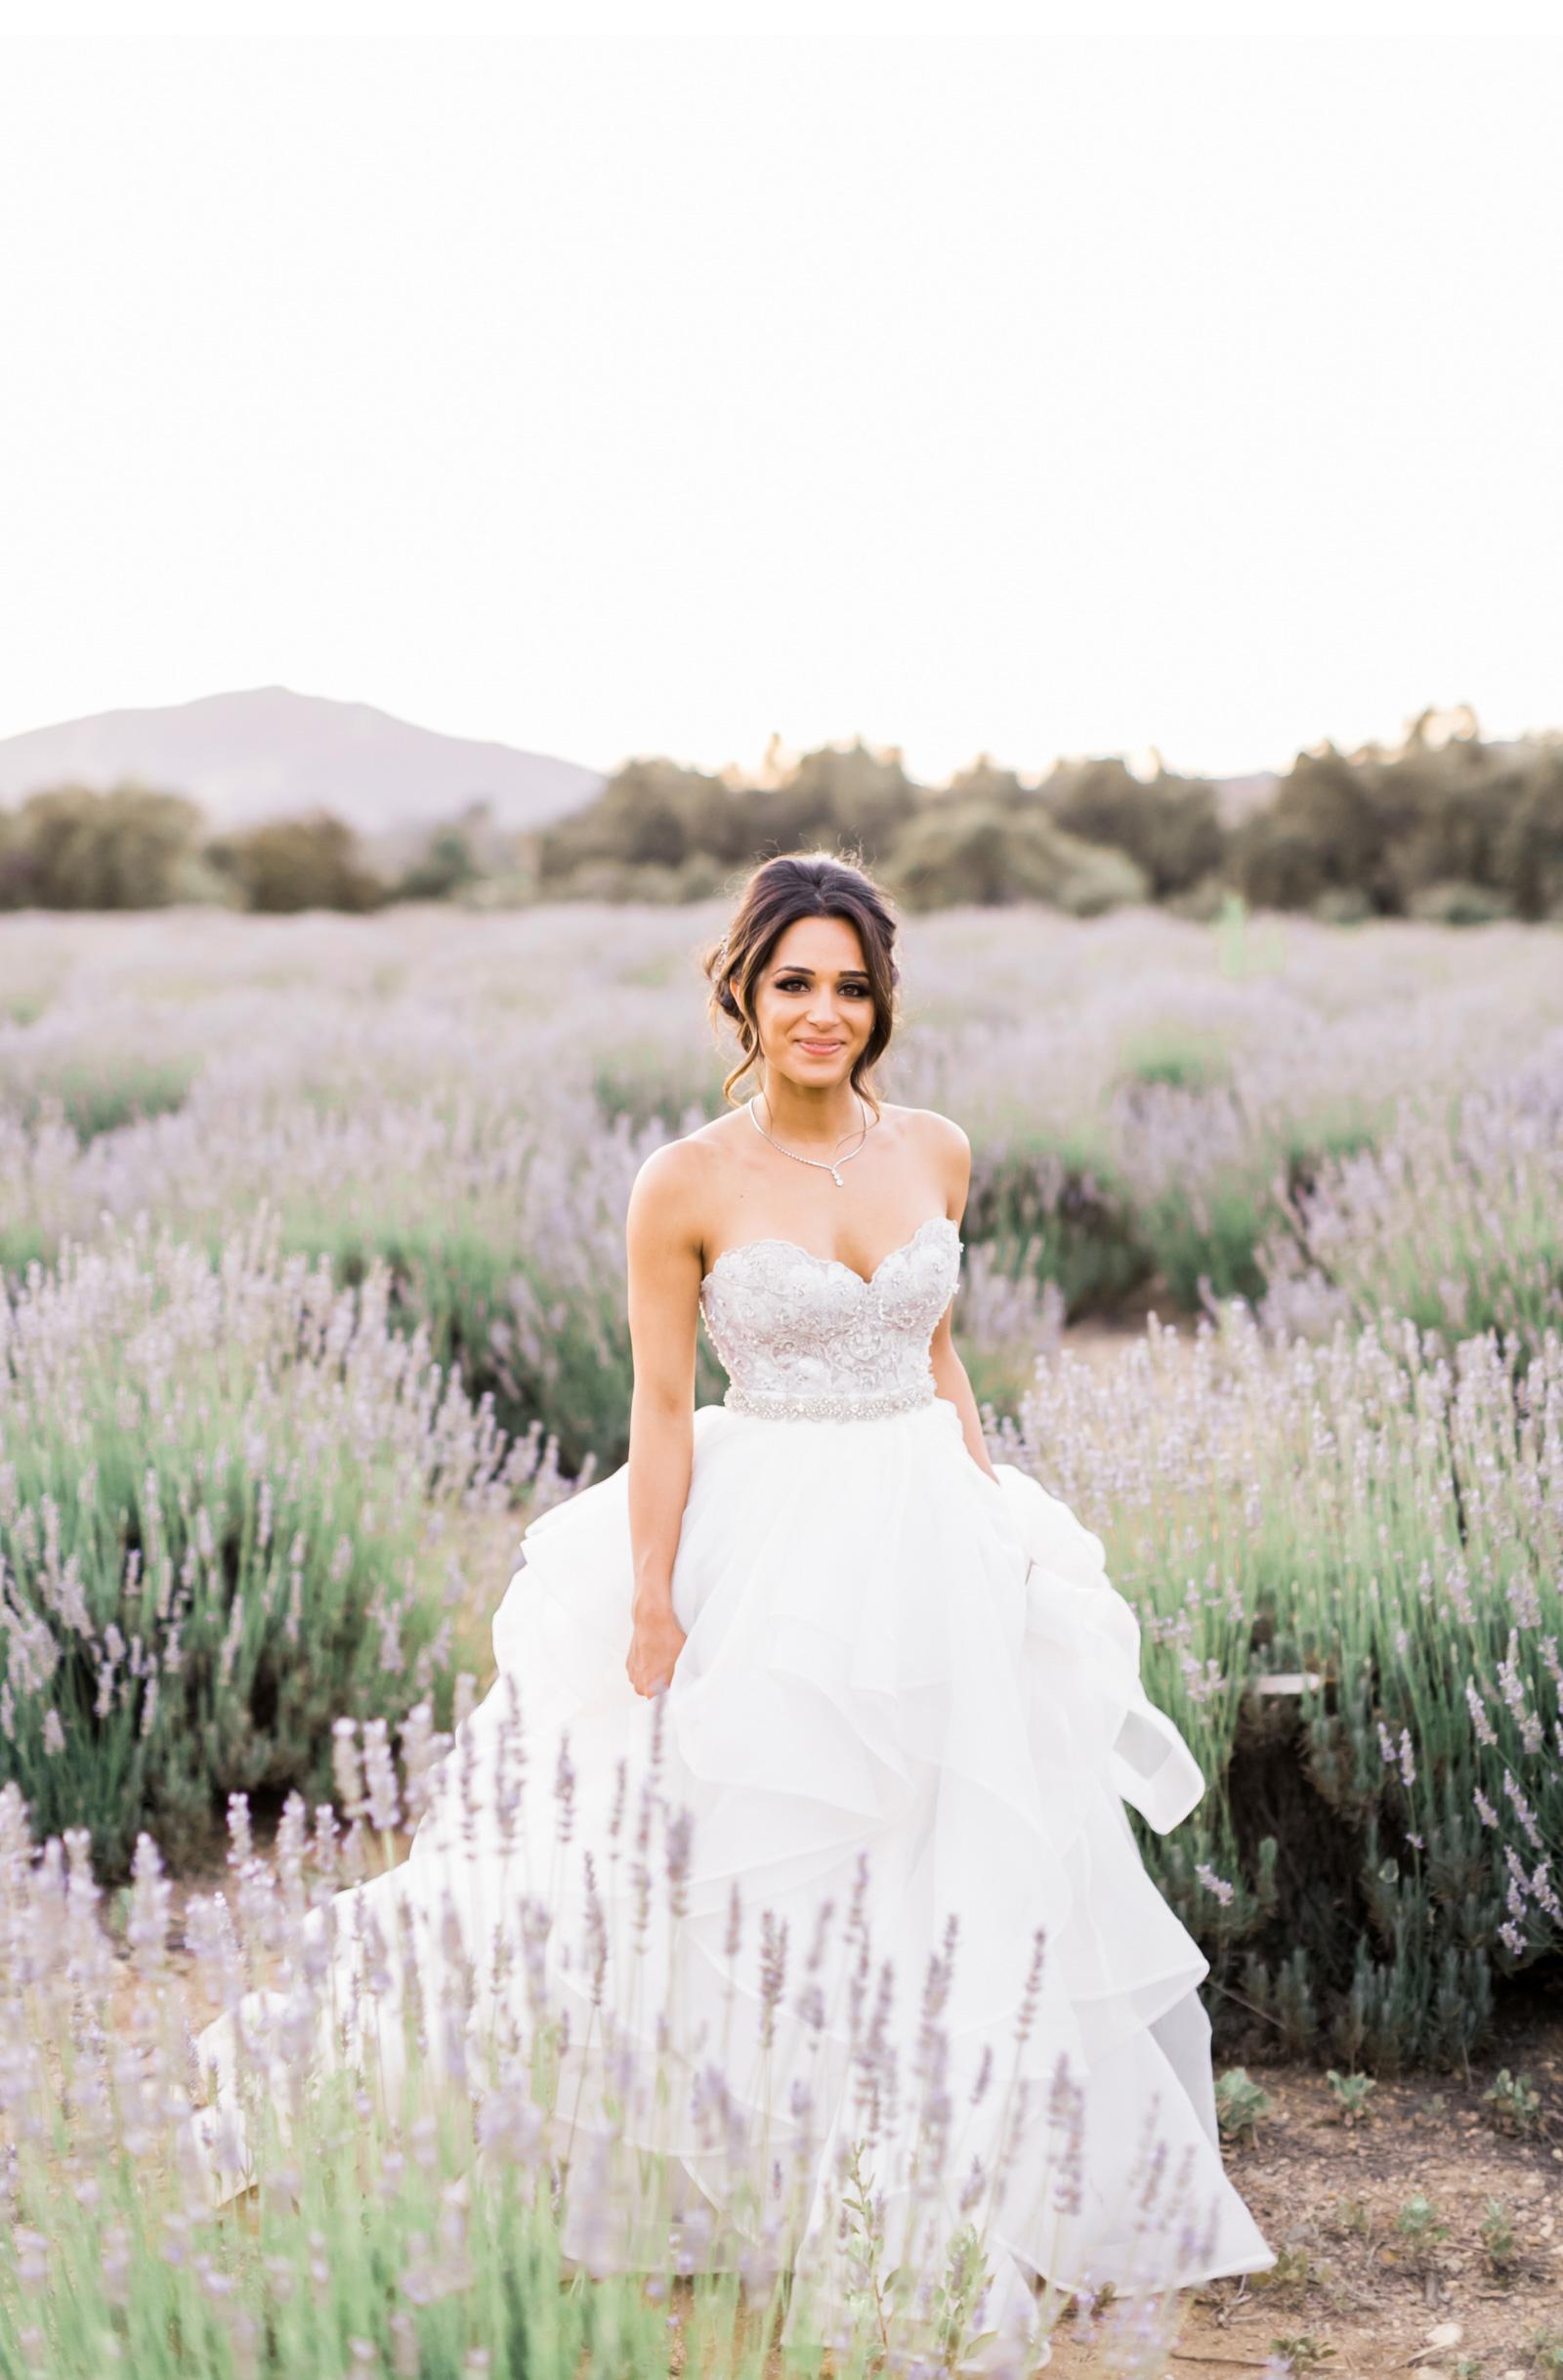 California-Lavender-Field-Wedding-Natalie-Schutt-Photography-Style-Me-Pretty_10.jpg